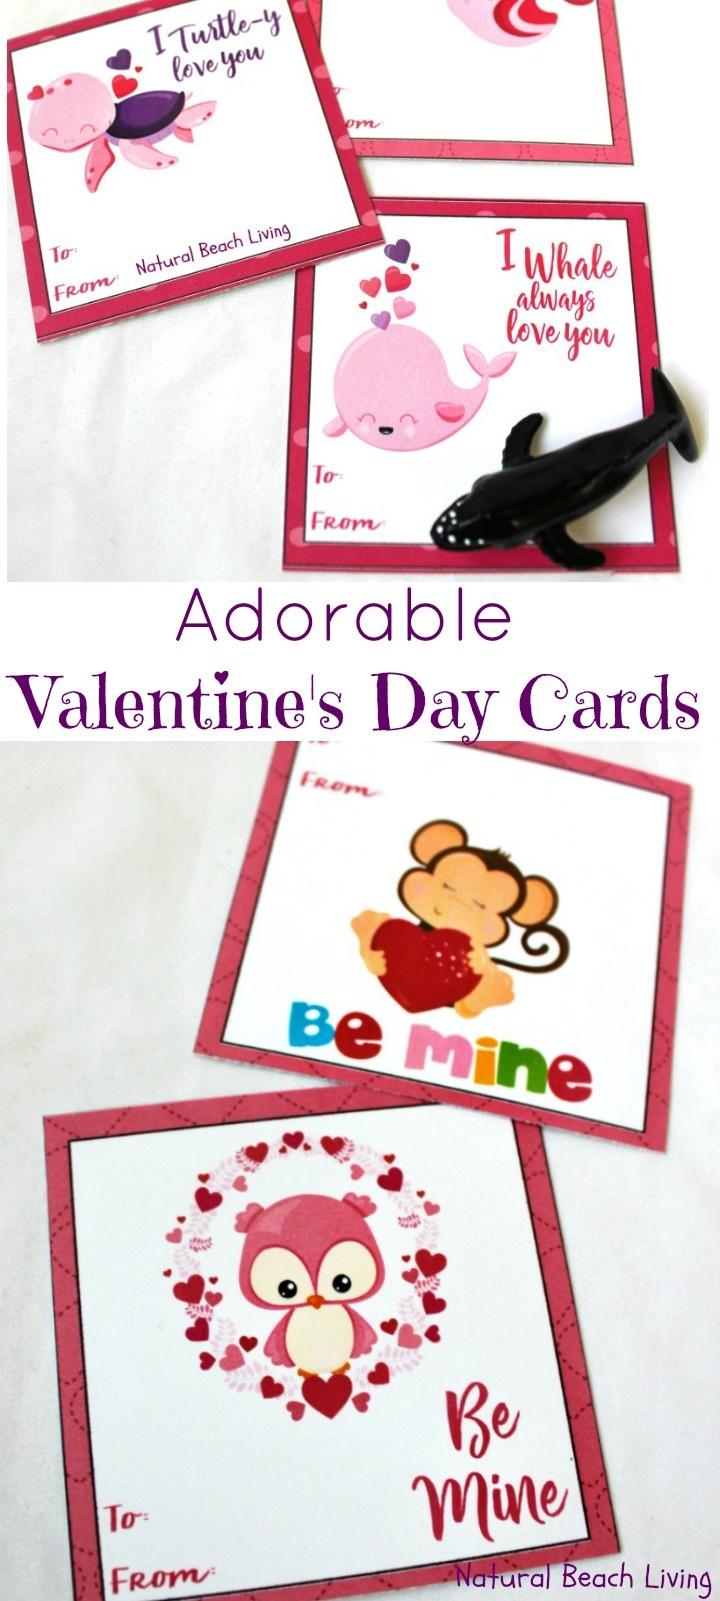 Adorable Preschool Valentine's Day Cards (Free Printables) - Natural - Free Printable Valentines Day Cards Kids